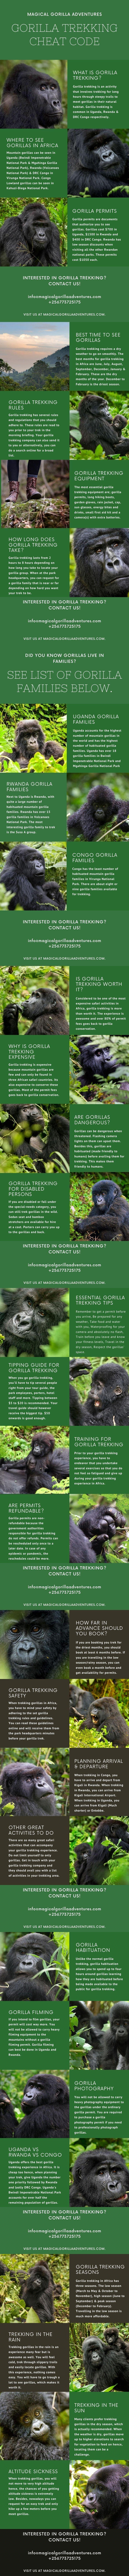 Gorilla Trekking Cheat Code